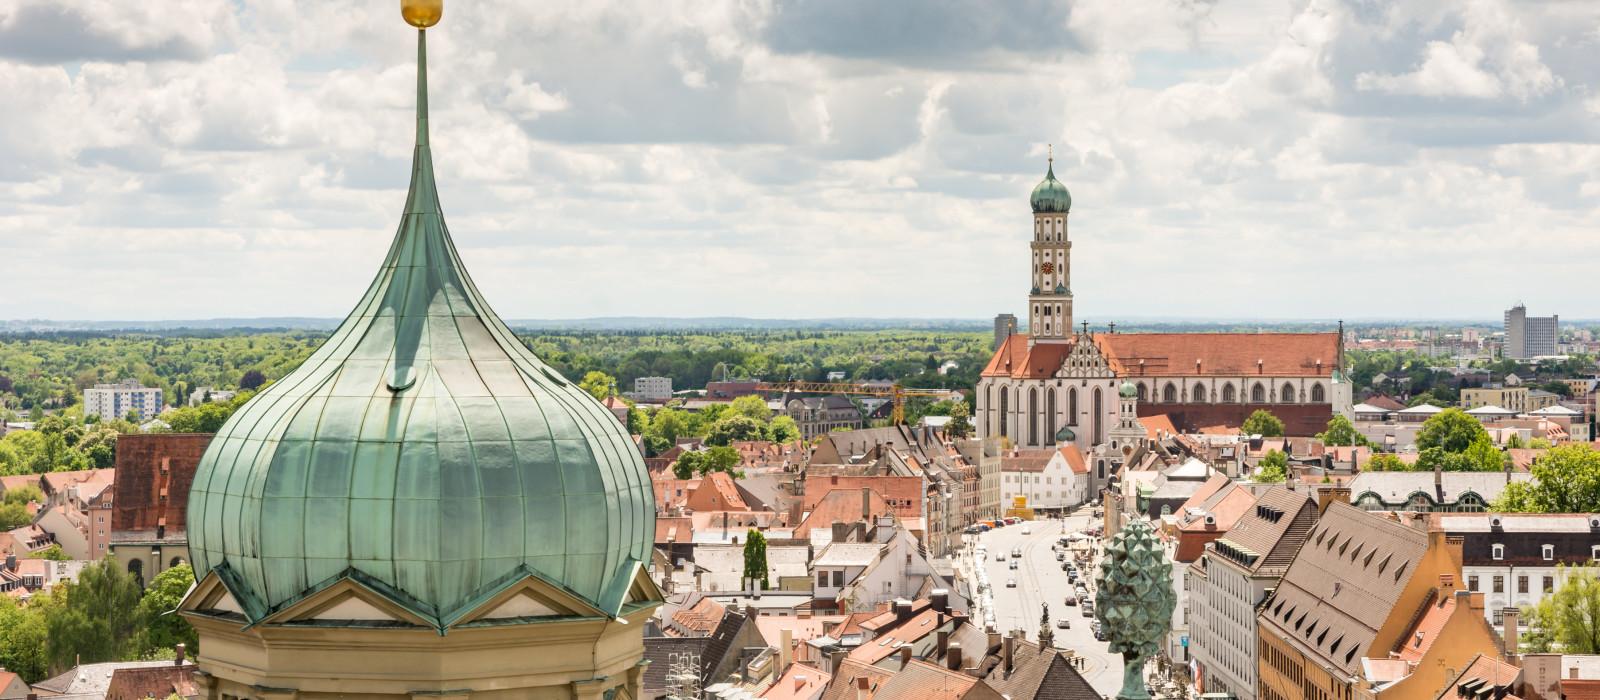 Destination Augsburg Germany